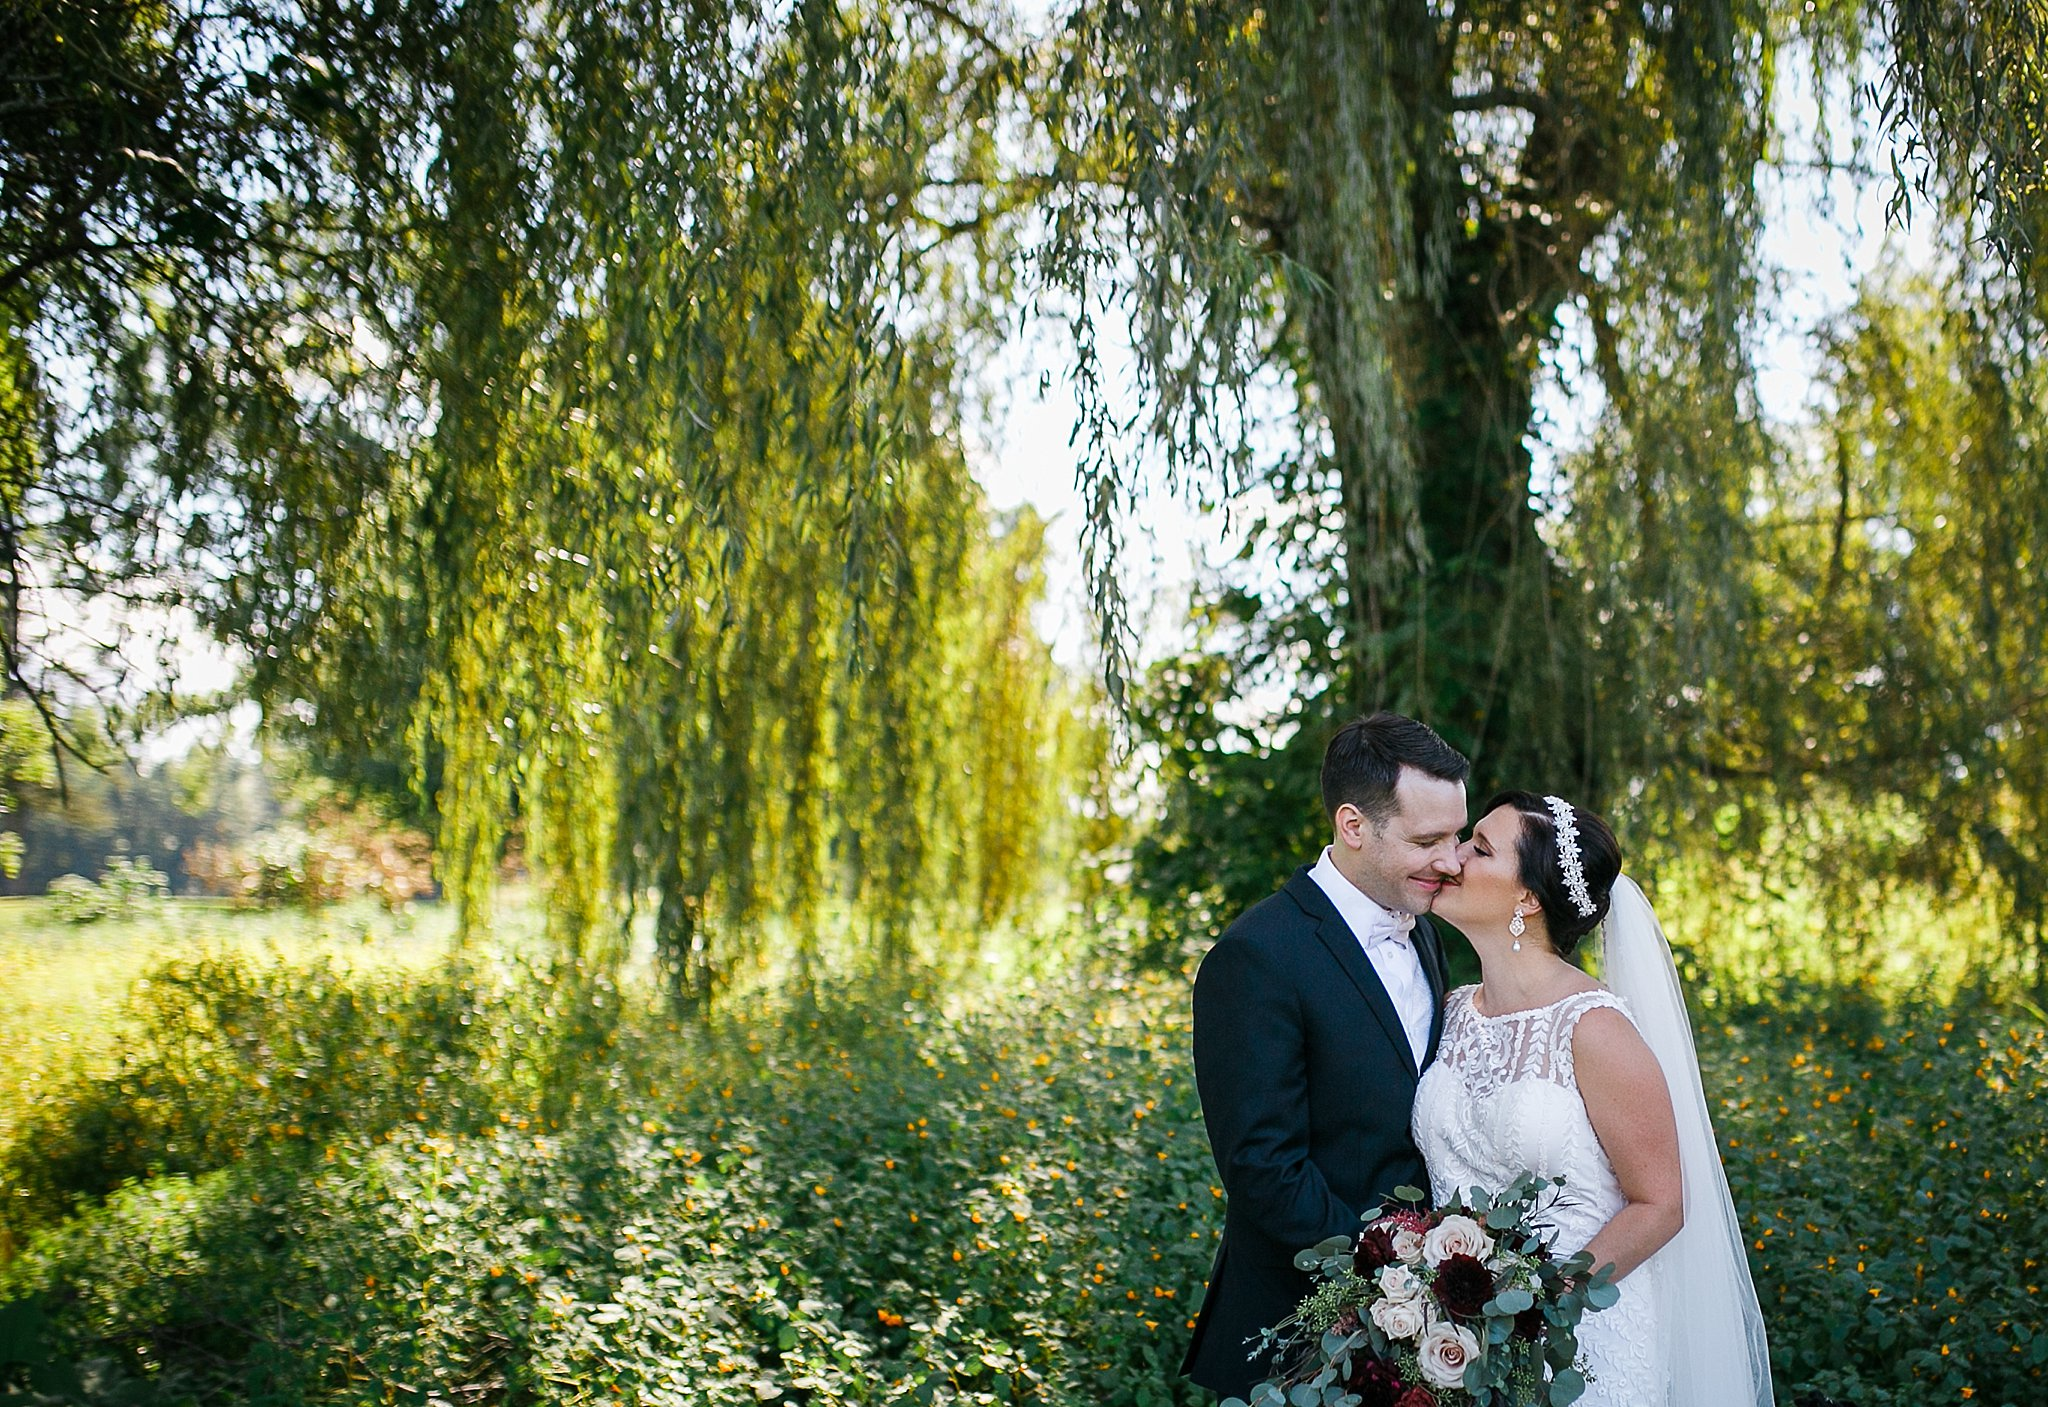 West Hills Country Club Wedding Gatsby Wedding Roaring Twenties Wedding Hudson Valley Wedding Photographer Sweet Alice Photography32.jpg